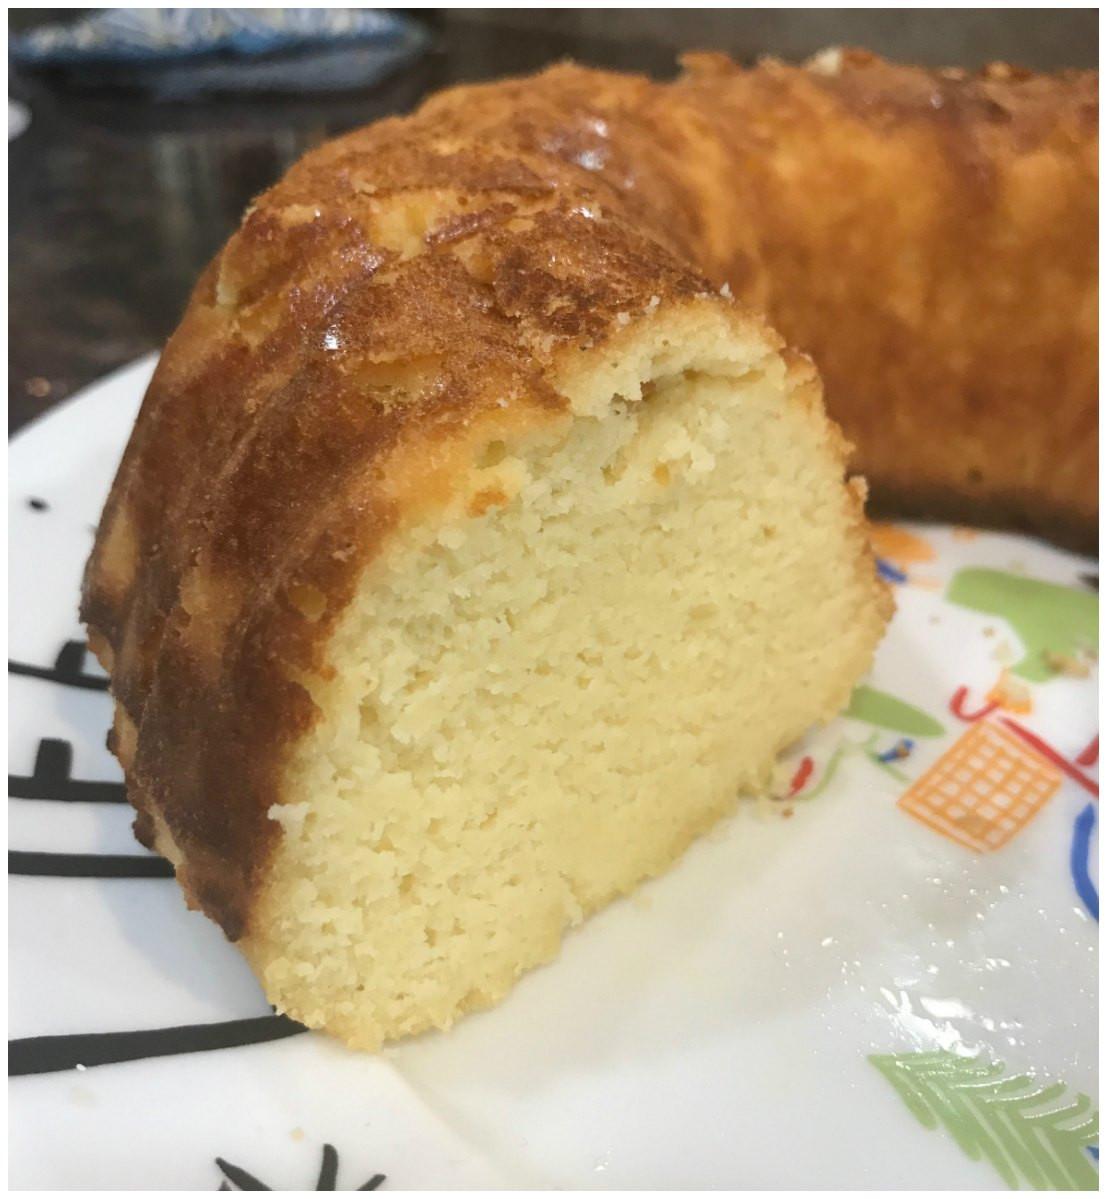 Keto Cake Recipes  Low Carb and Keto Friendly Butter Cake Recipe iSaveA2Z